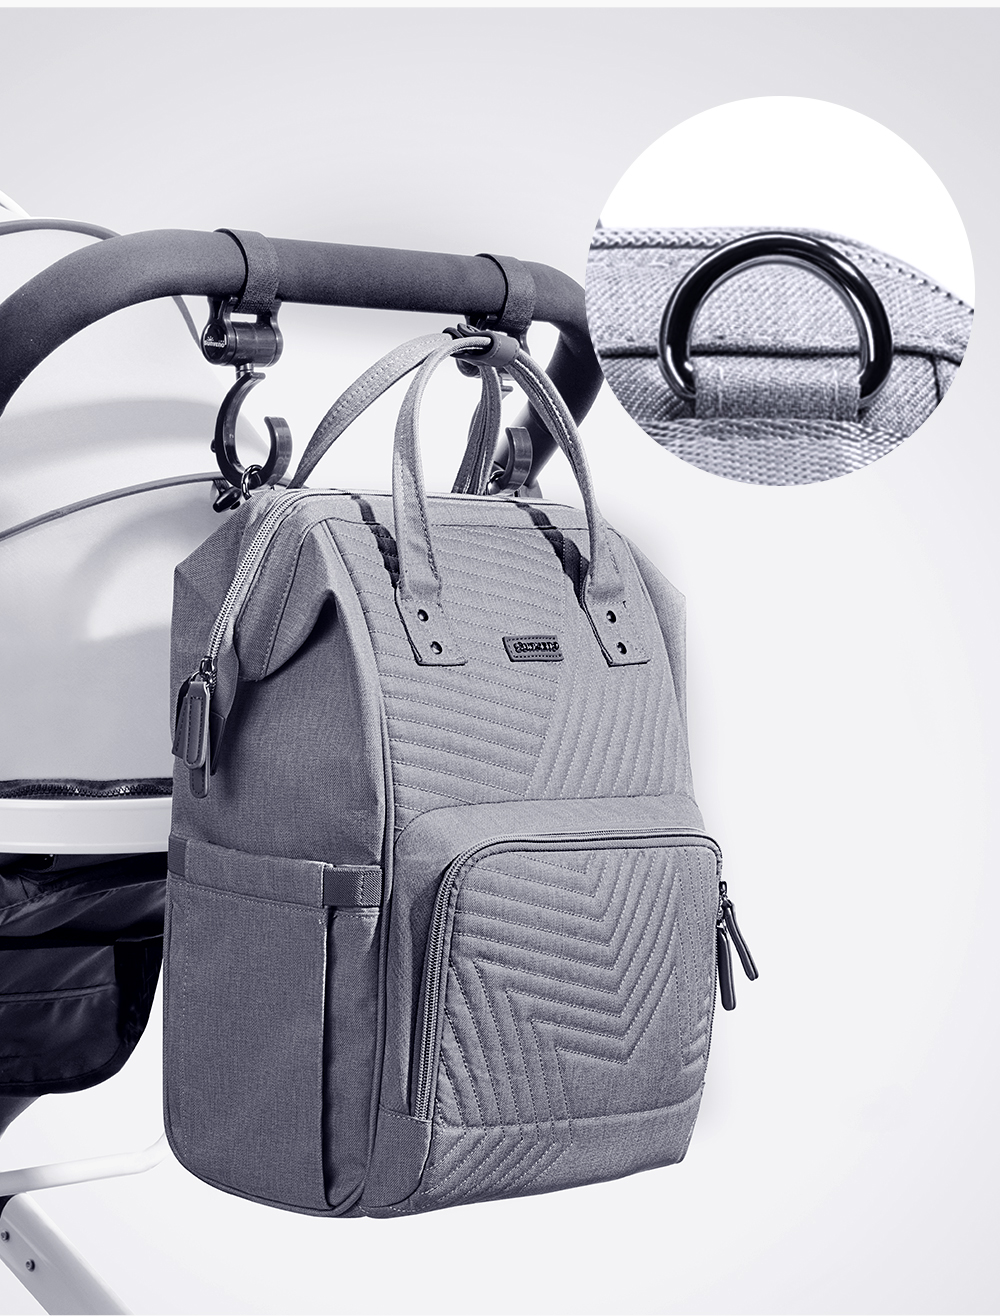 H253f6a17e8ef4ac7abd47f9b3a43675e1 Sunveno Fashion Diaper Bag Backpack Quilted Large Mum Maternity Nursing Bag Travel Backpack Stroller Baby Bag Nappy Baby Care